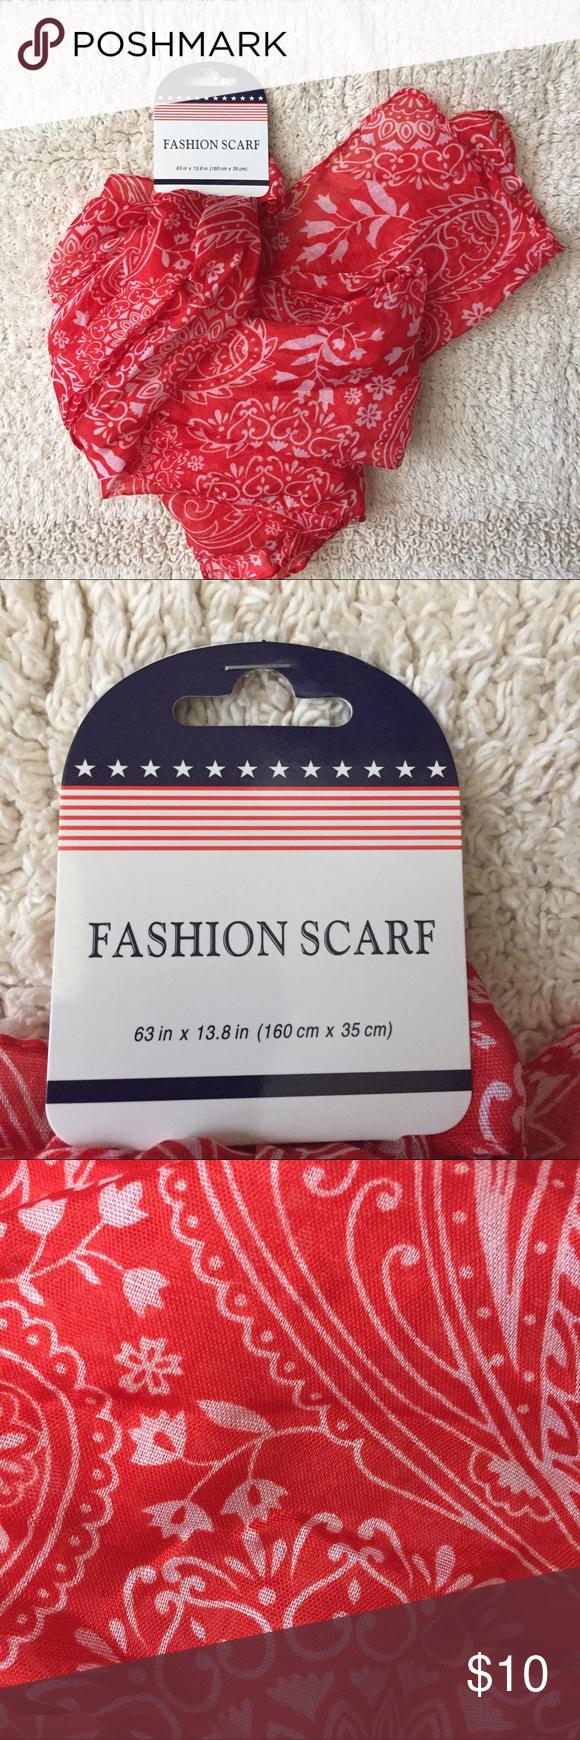 Holiday scarf | Holiday scarves, Cute scarfs, Scarf accessory